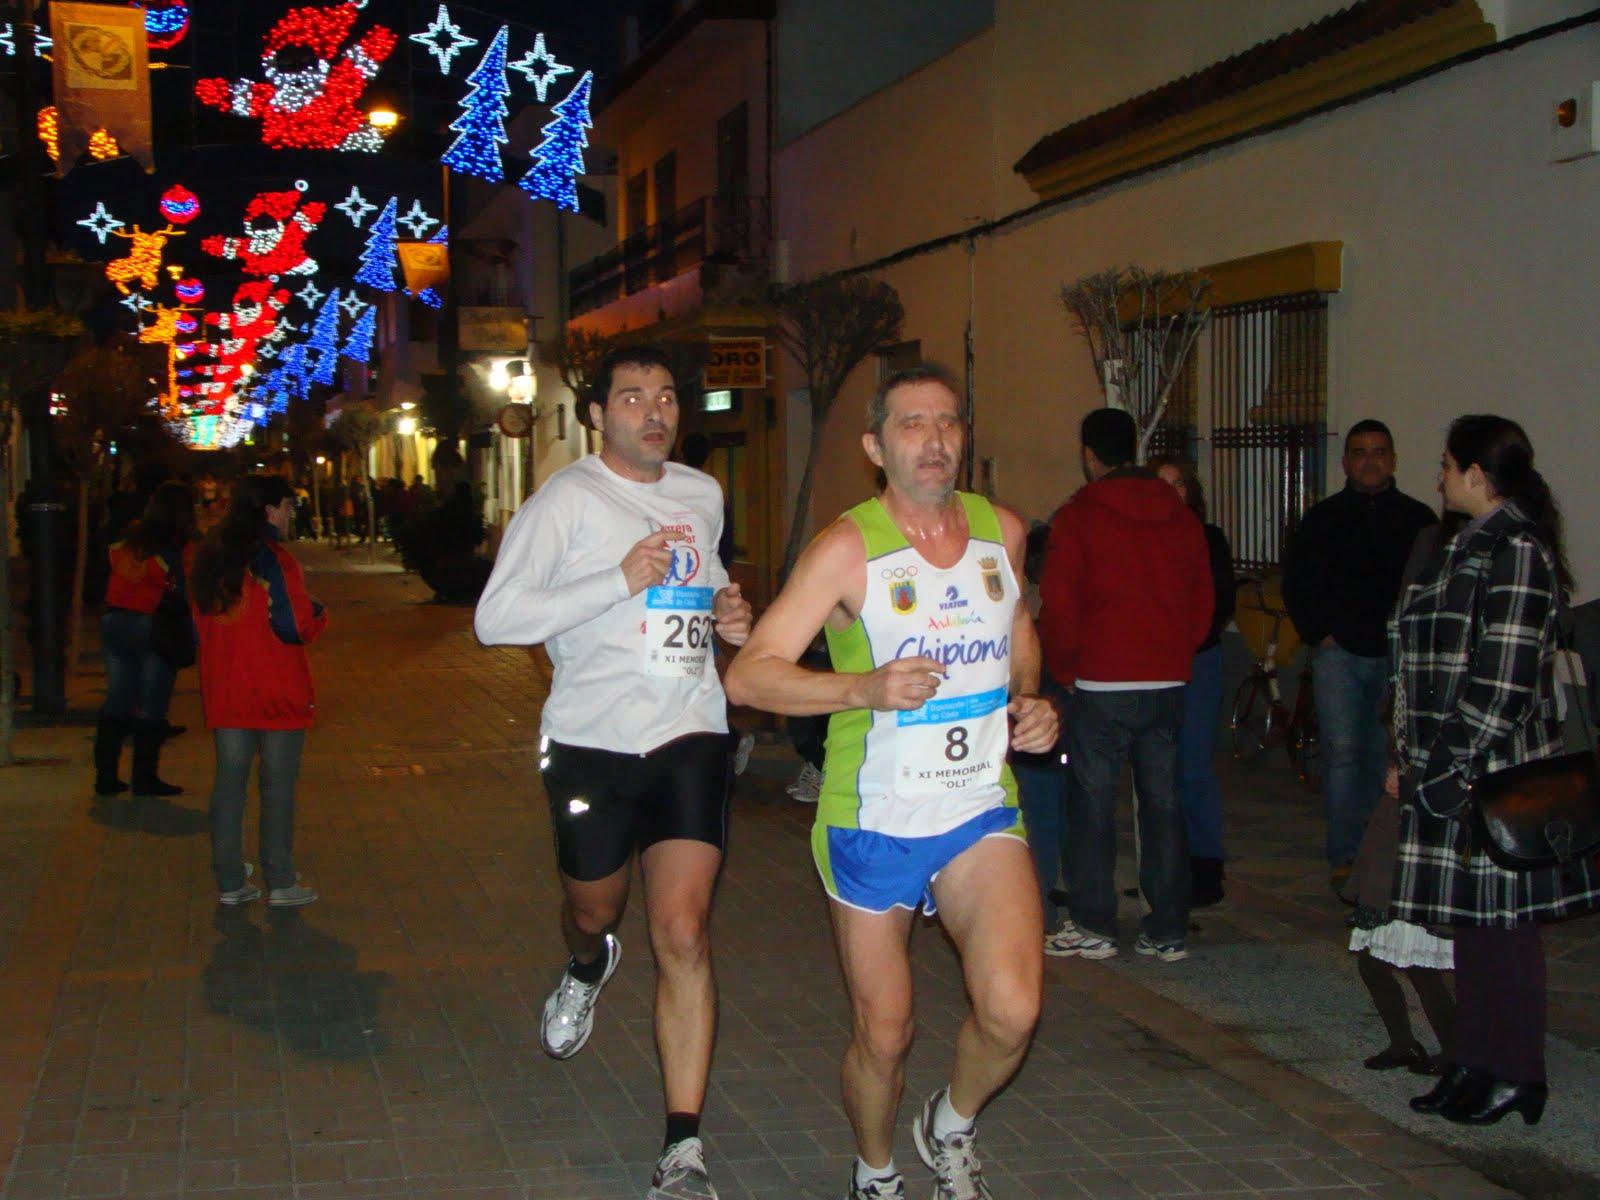 Club atletismo chipiona celebramos la xvii carrera - Sakura el puerto de santa maria ...